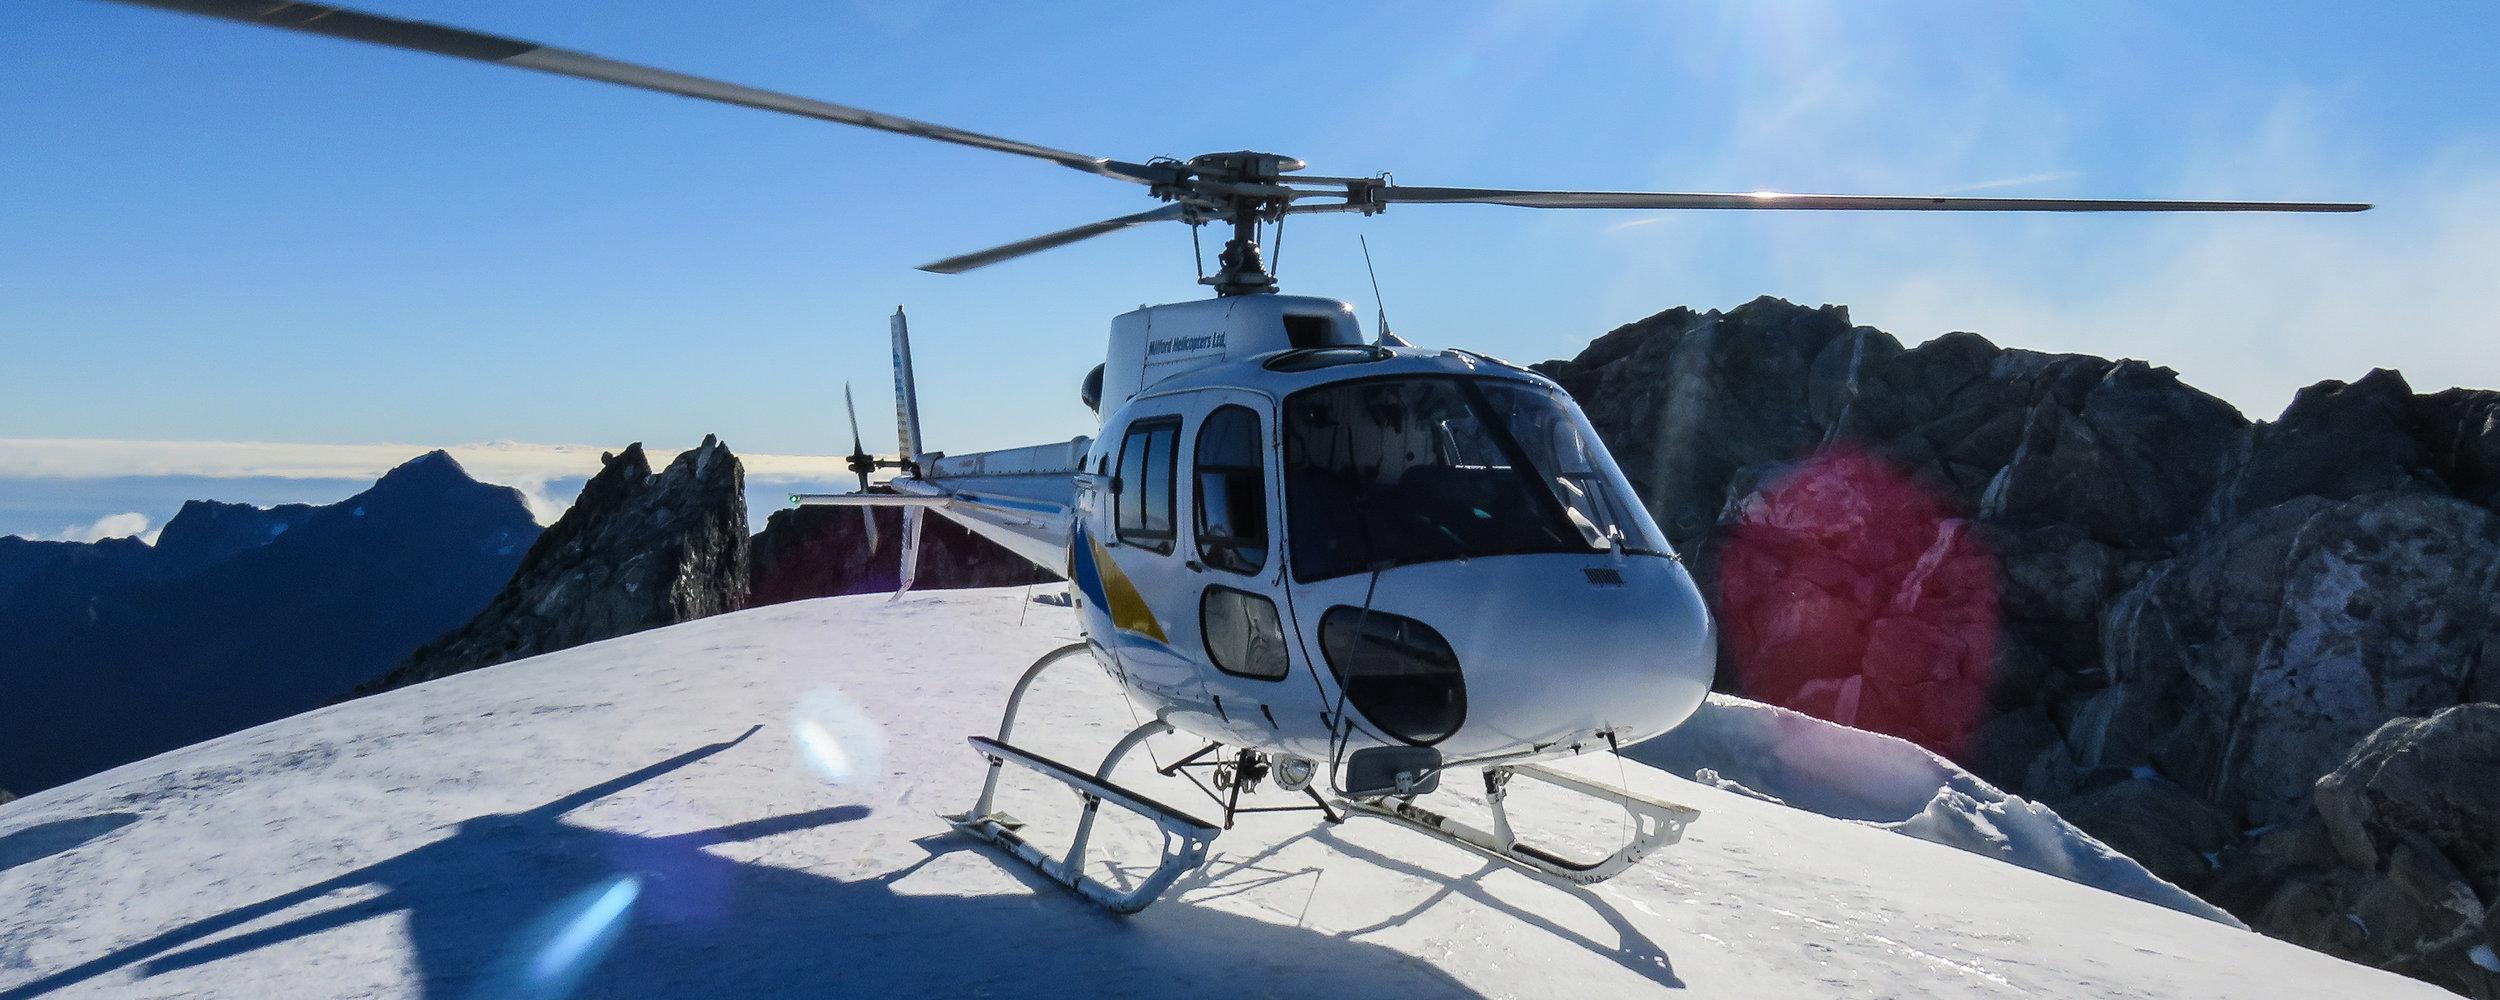 good picnew-zealand-milford-helicopter-mount-tutoko-glacier-landing3.jpg